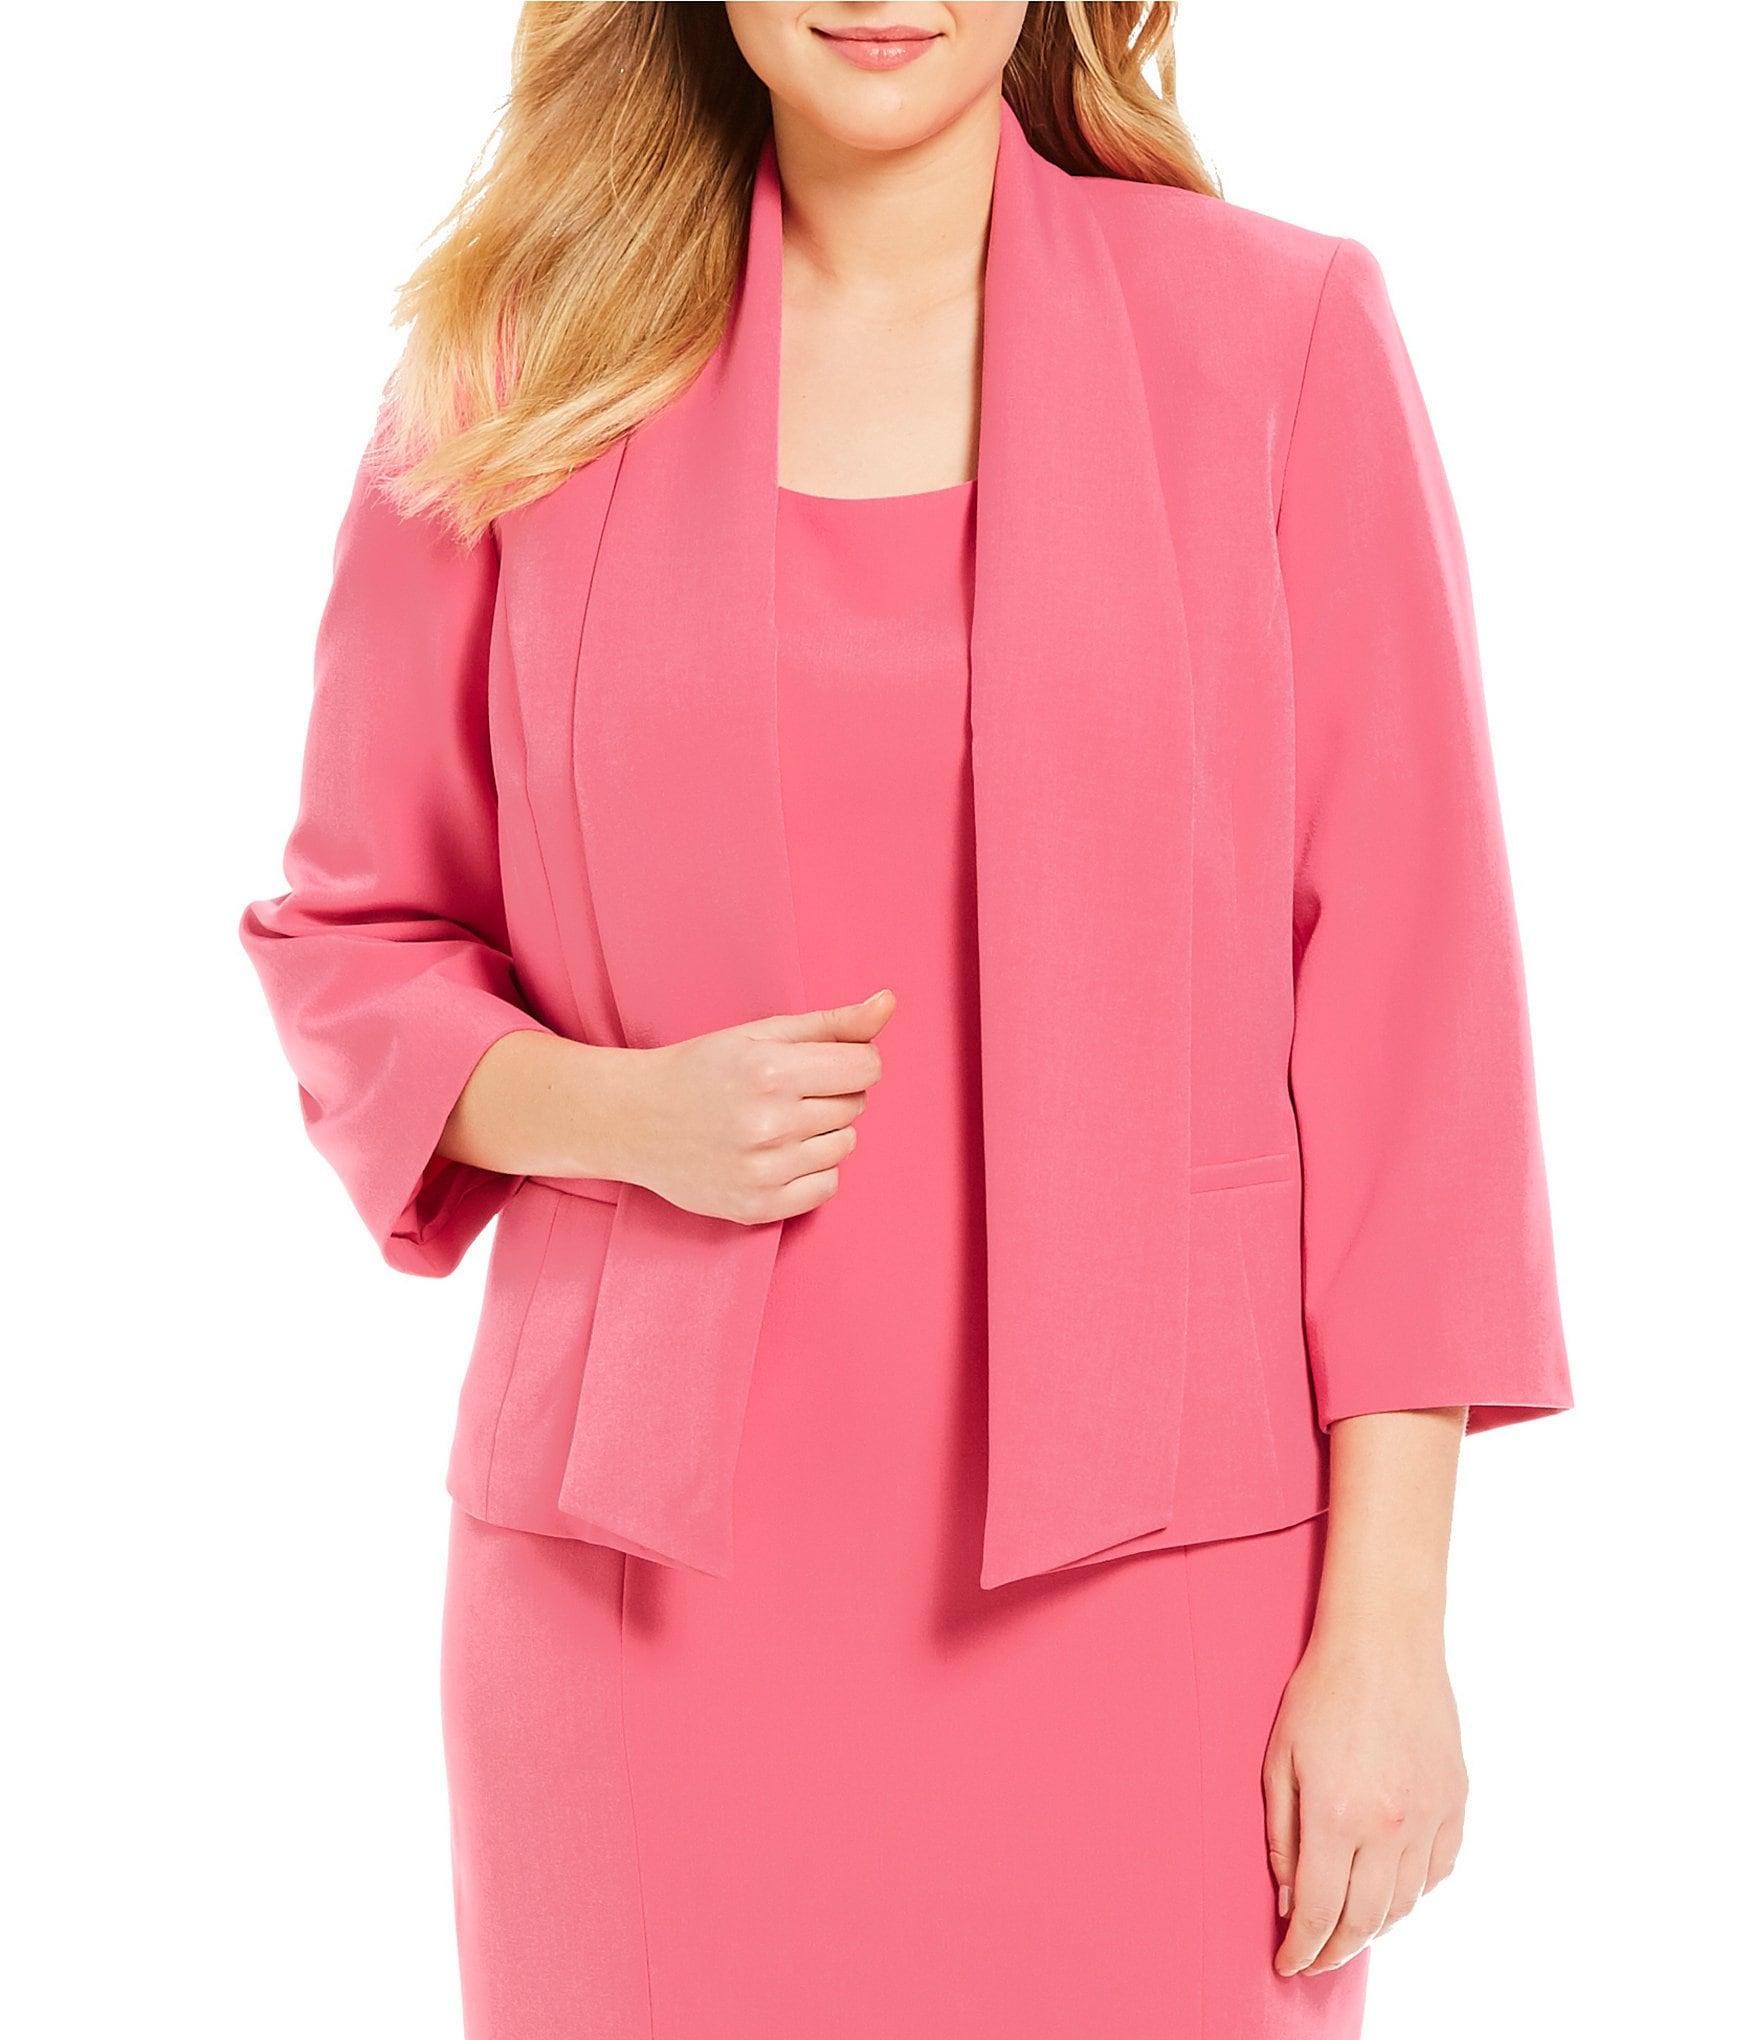 Clearance Women\'s Clothing   Dillards.com